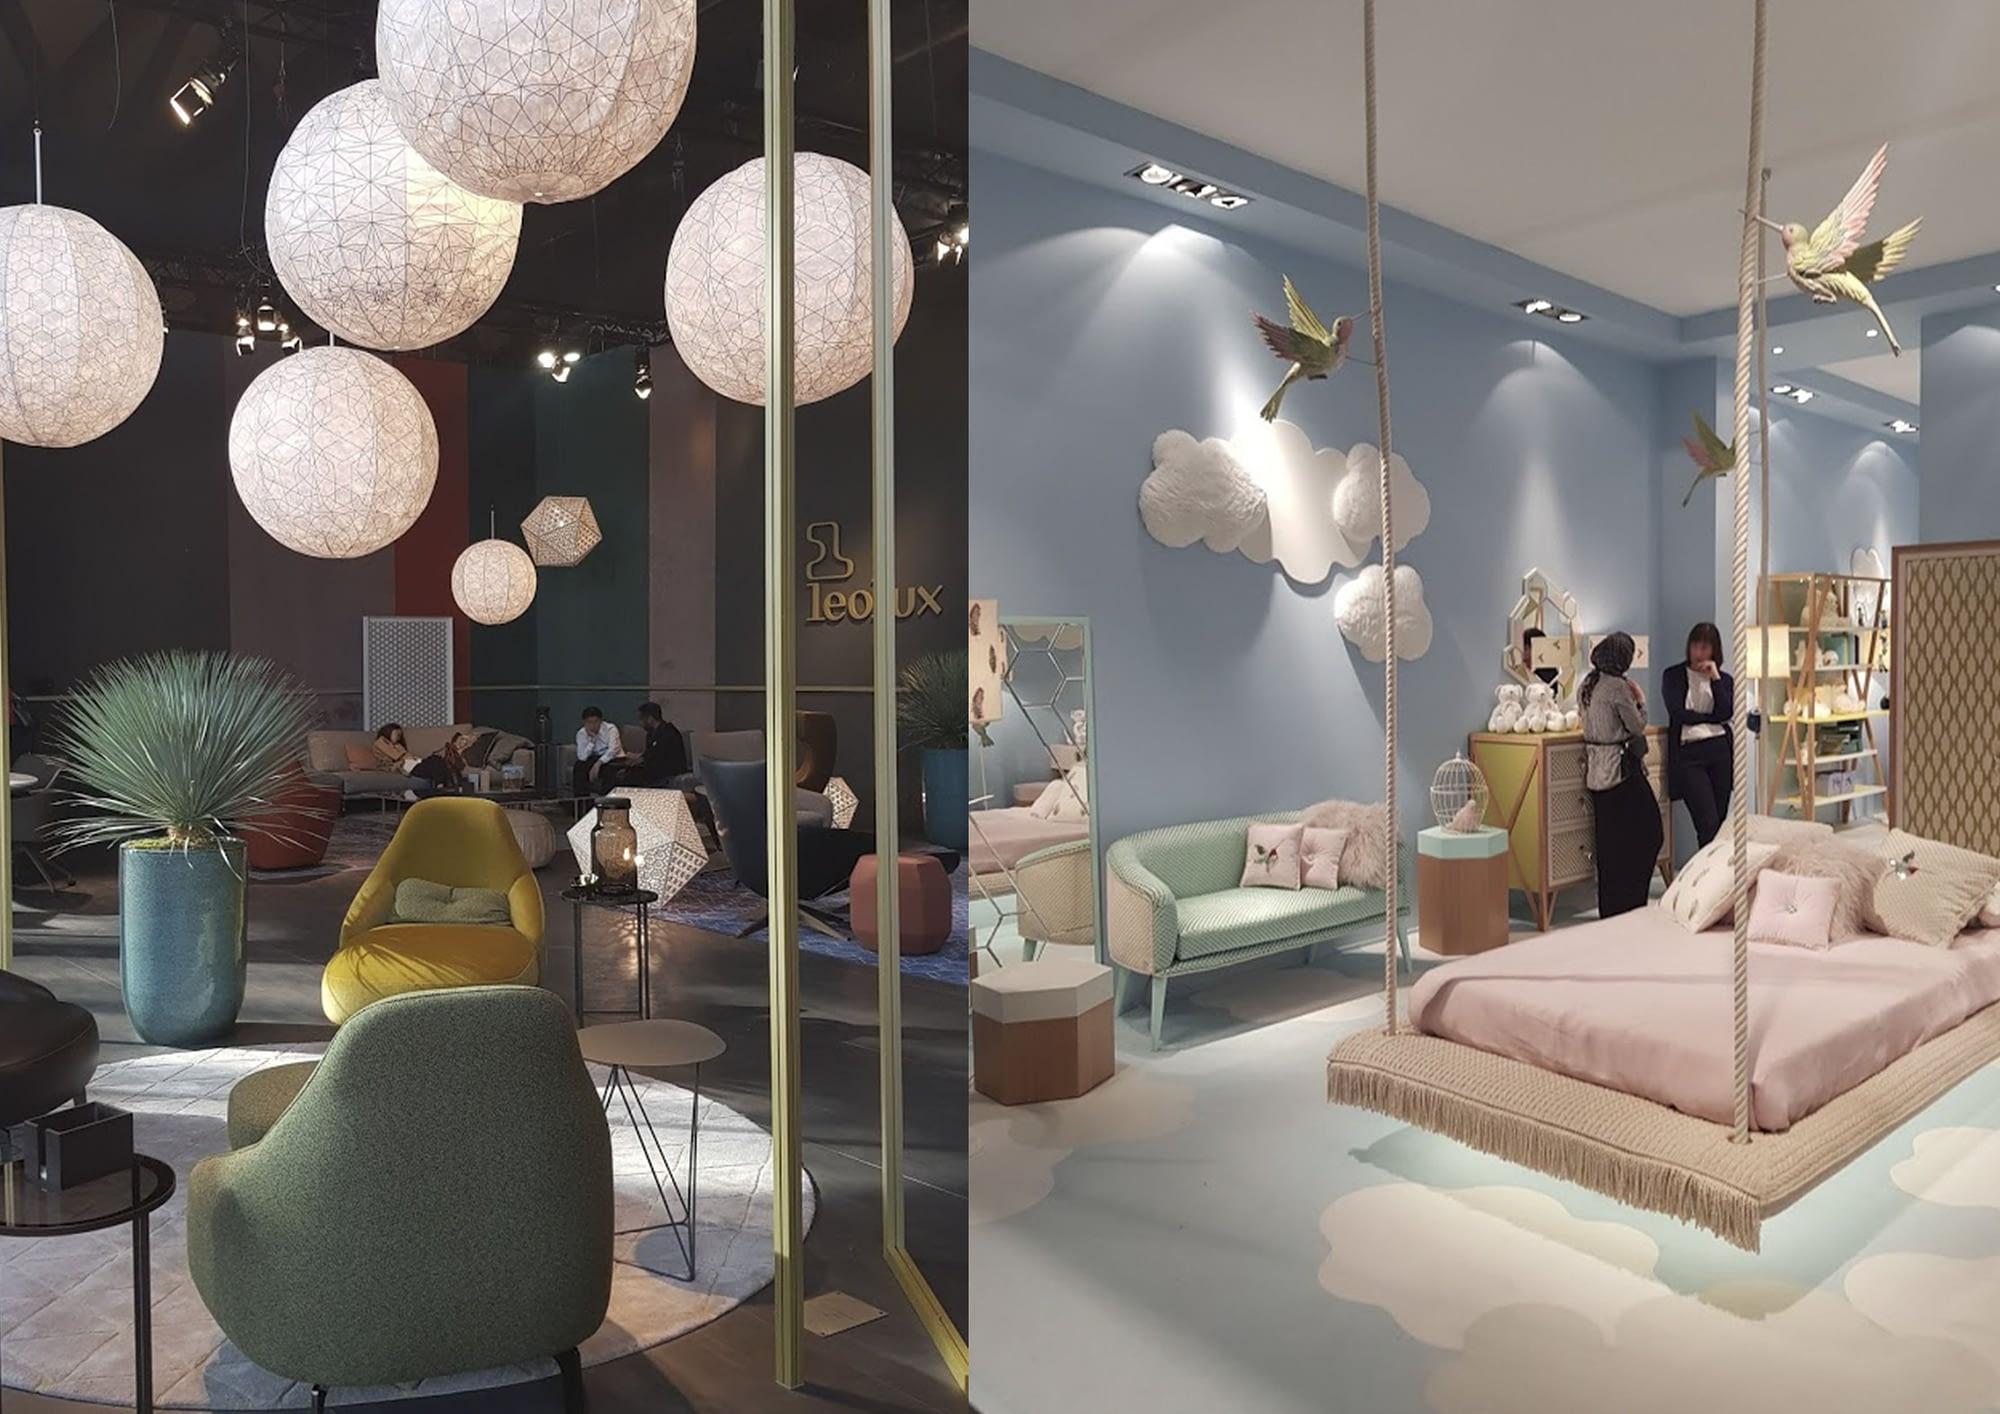 Milano Design Week 2018 - Salone del Mobile 77